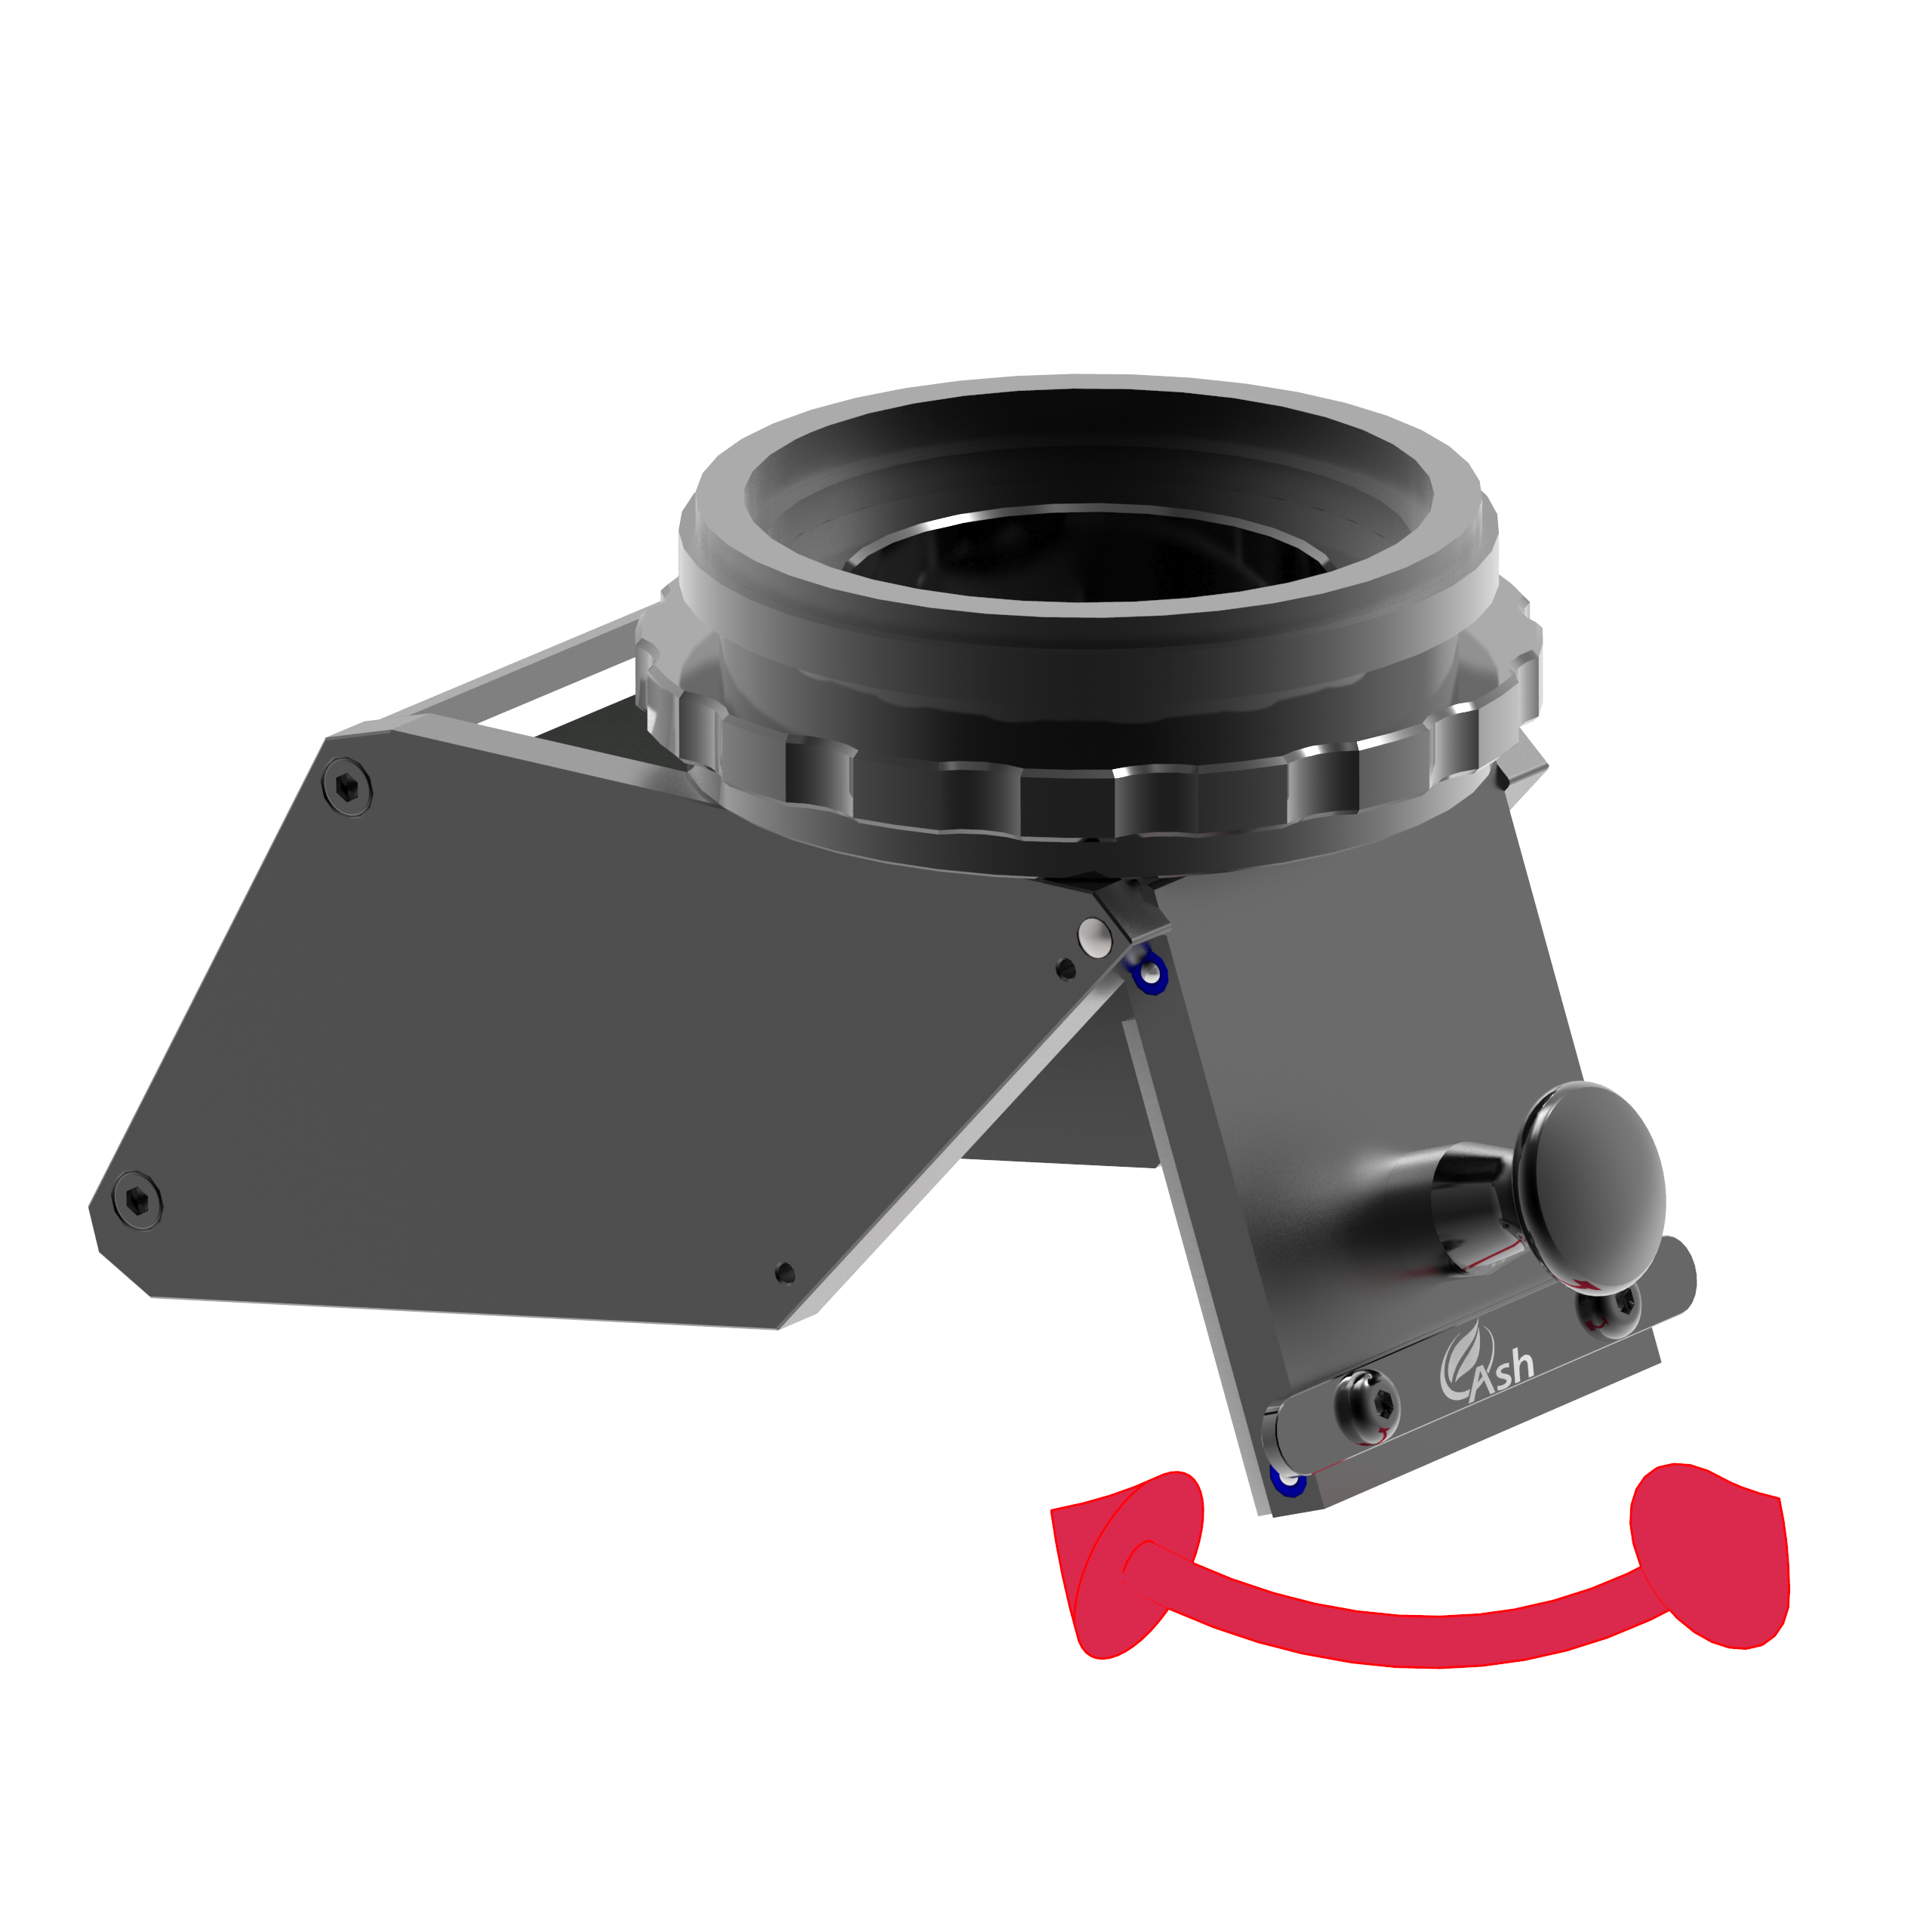 Ash AI-801-422 360° Rotating Viewer for Omni Core/Inspex II